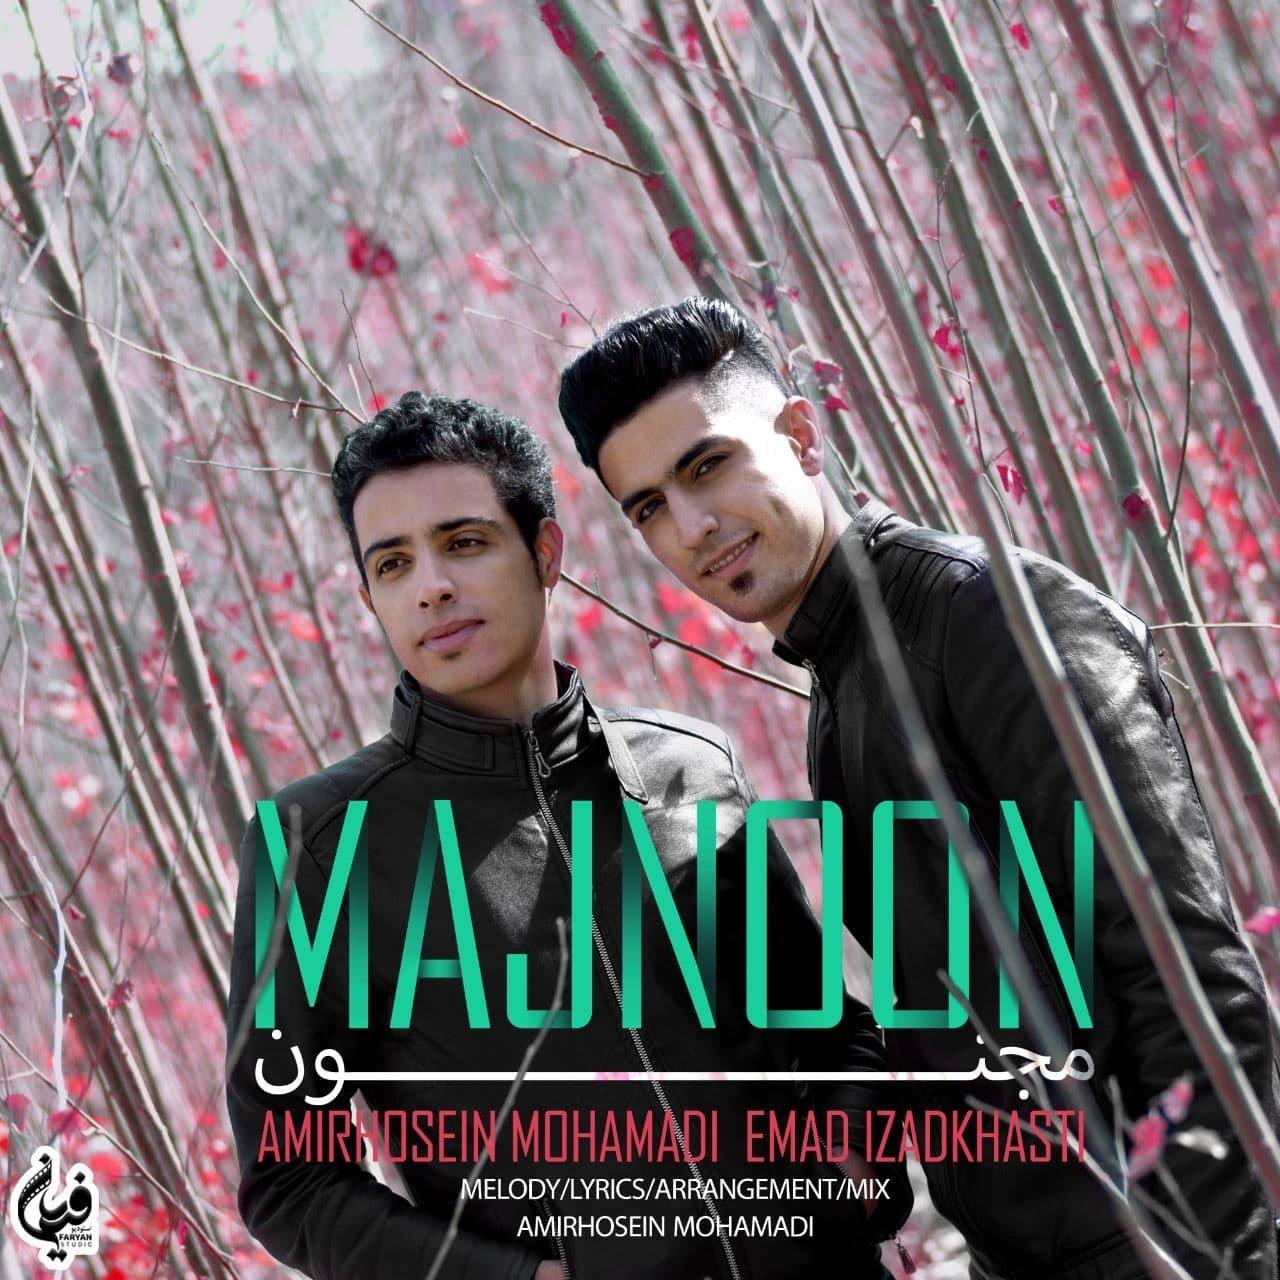 Amirhosein Mohamadi & Emad Izadkhasti – Majnoon